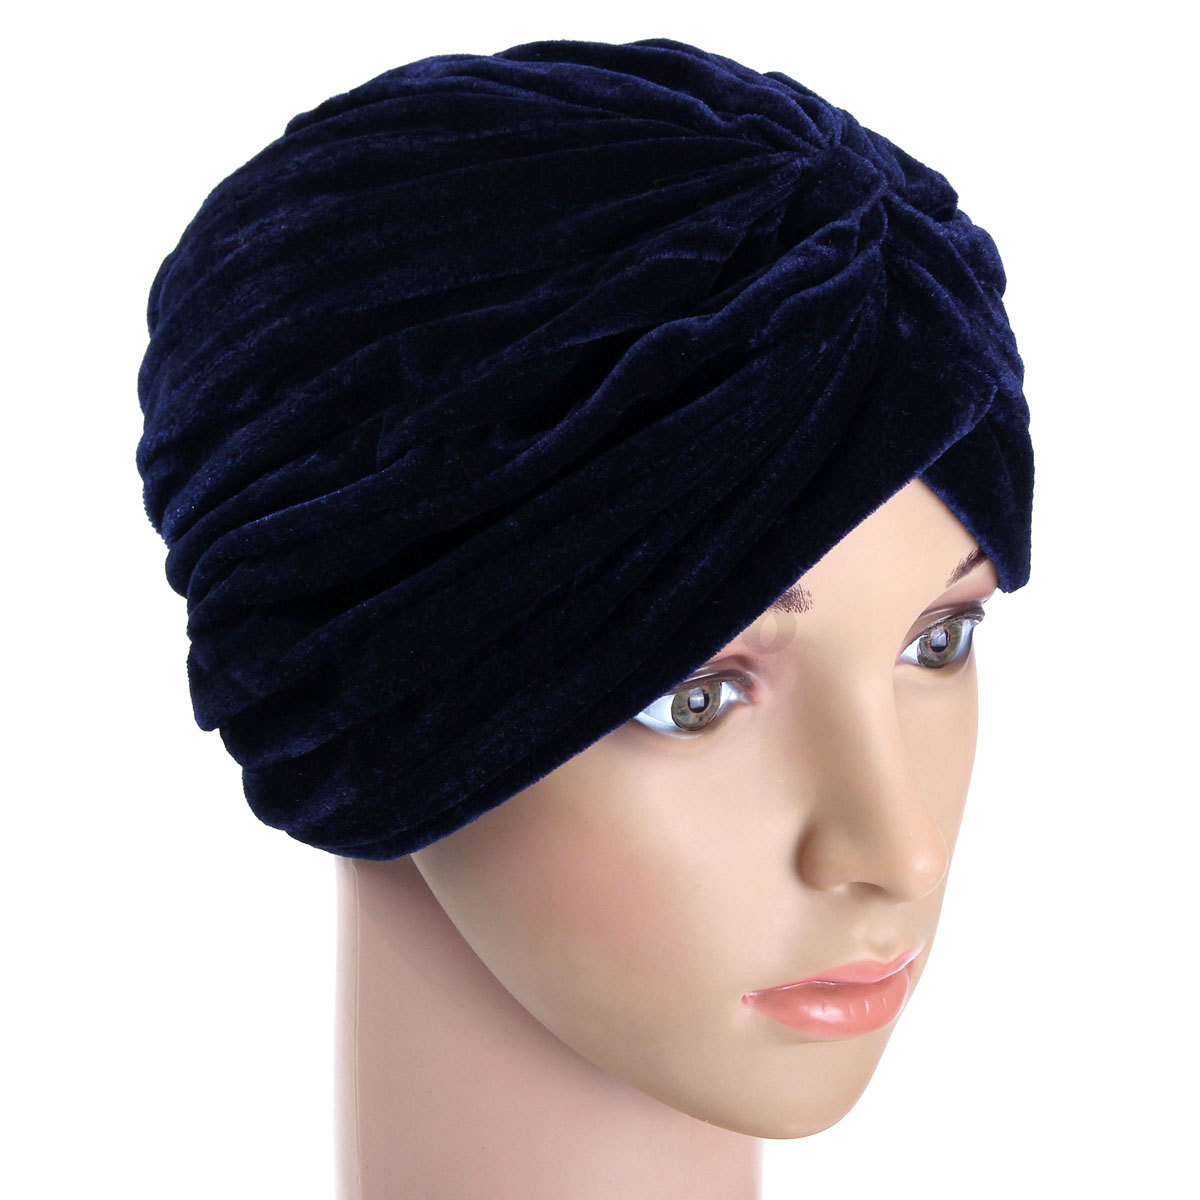 femme bonnet chapeau turban velours indien foulard extensible tissu souple mode ebay. Black Bedroom Furniture Sets. Home Design Ideas